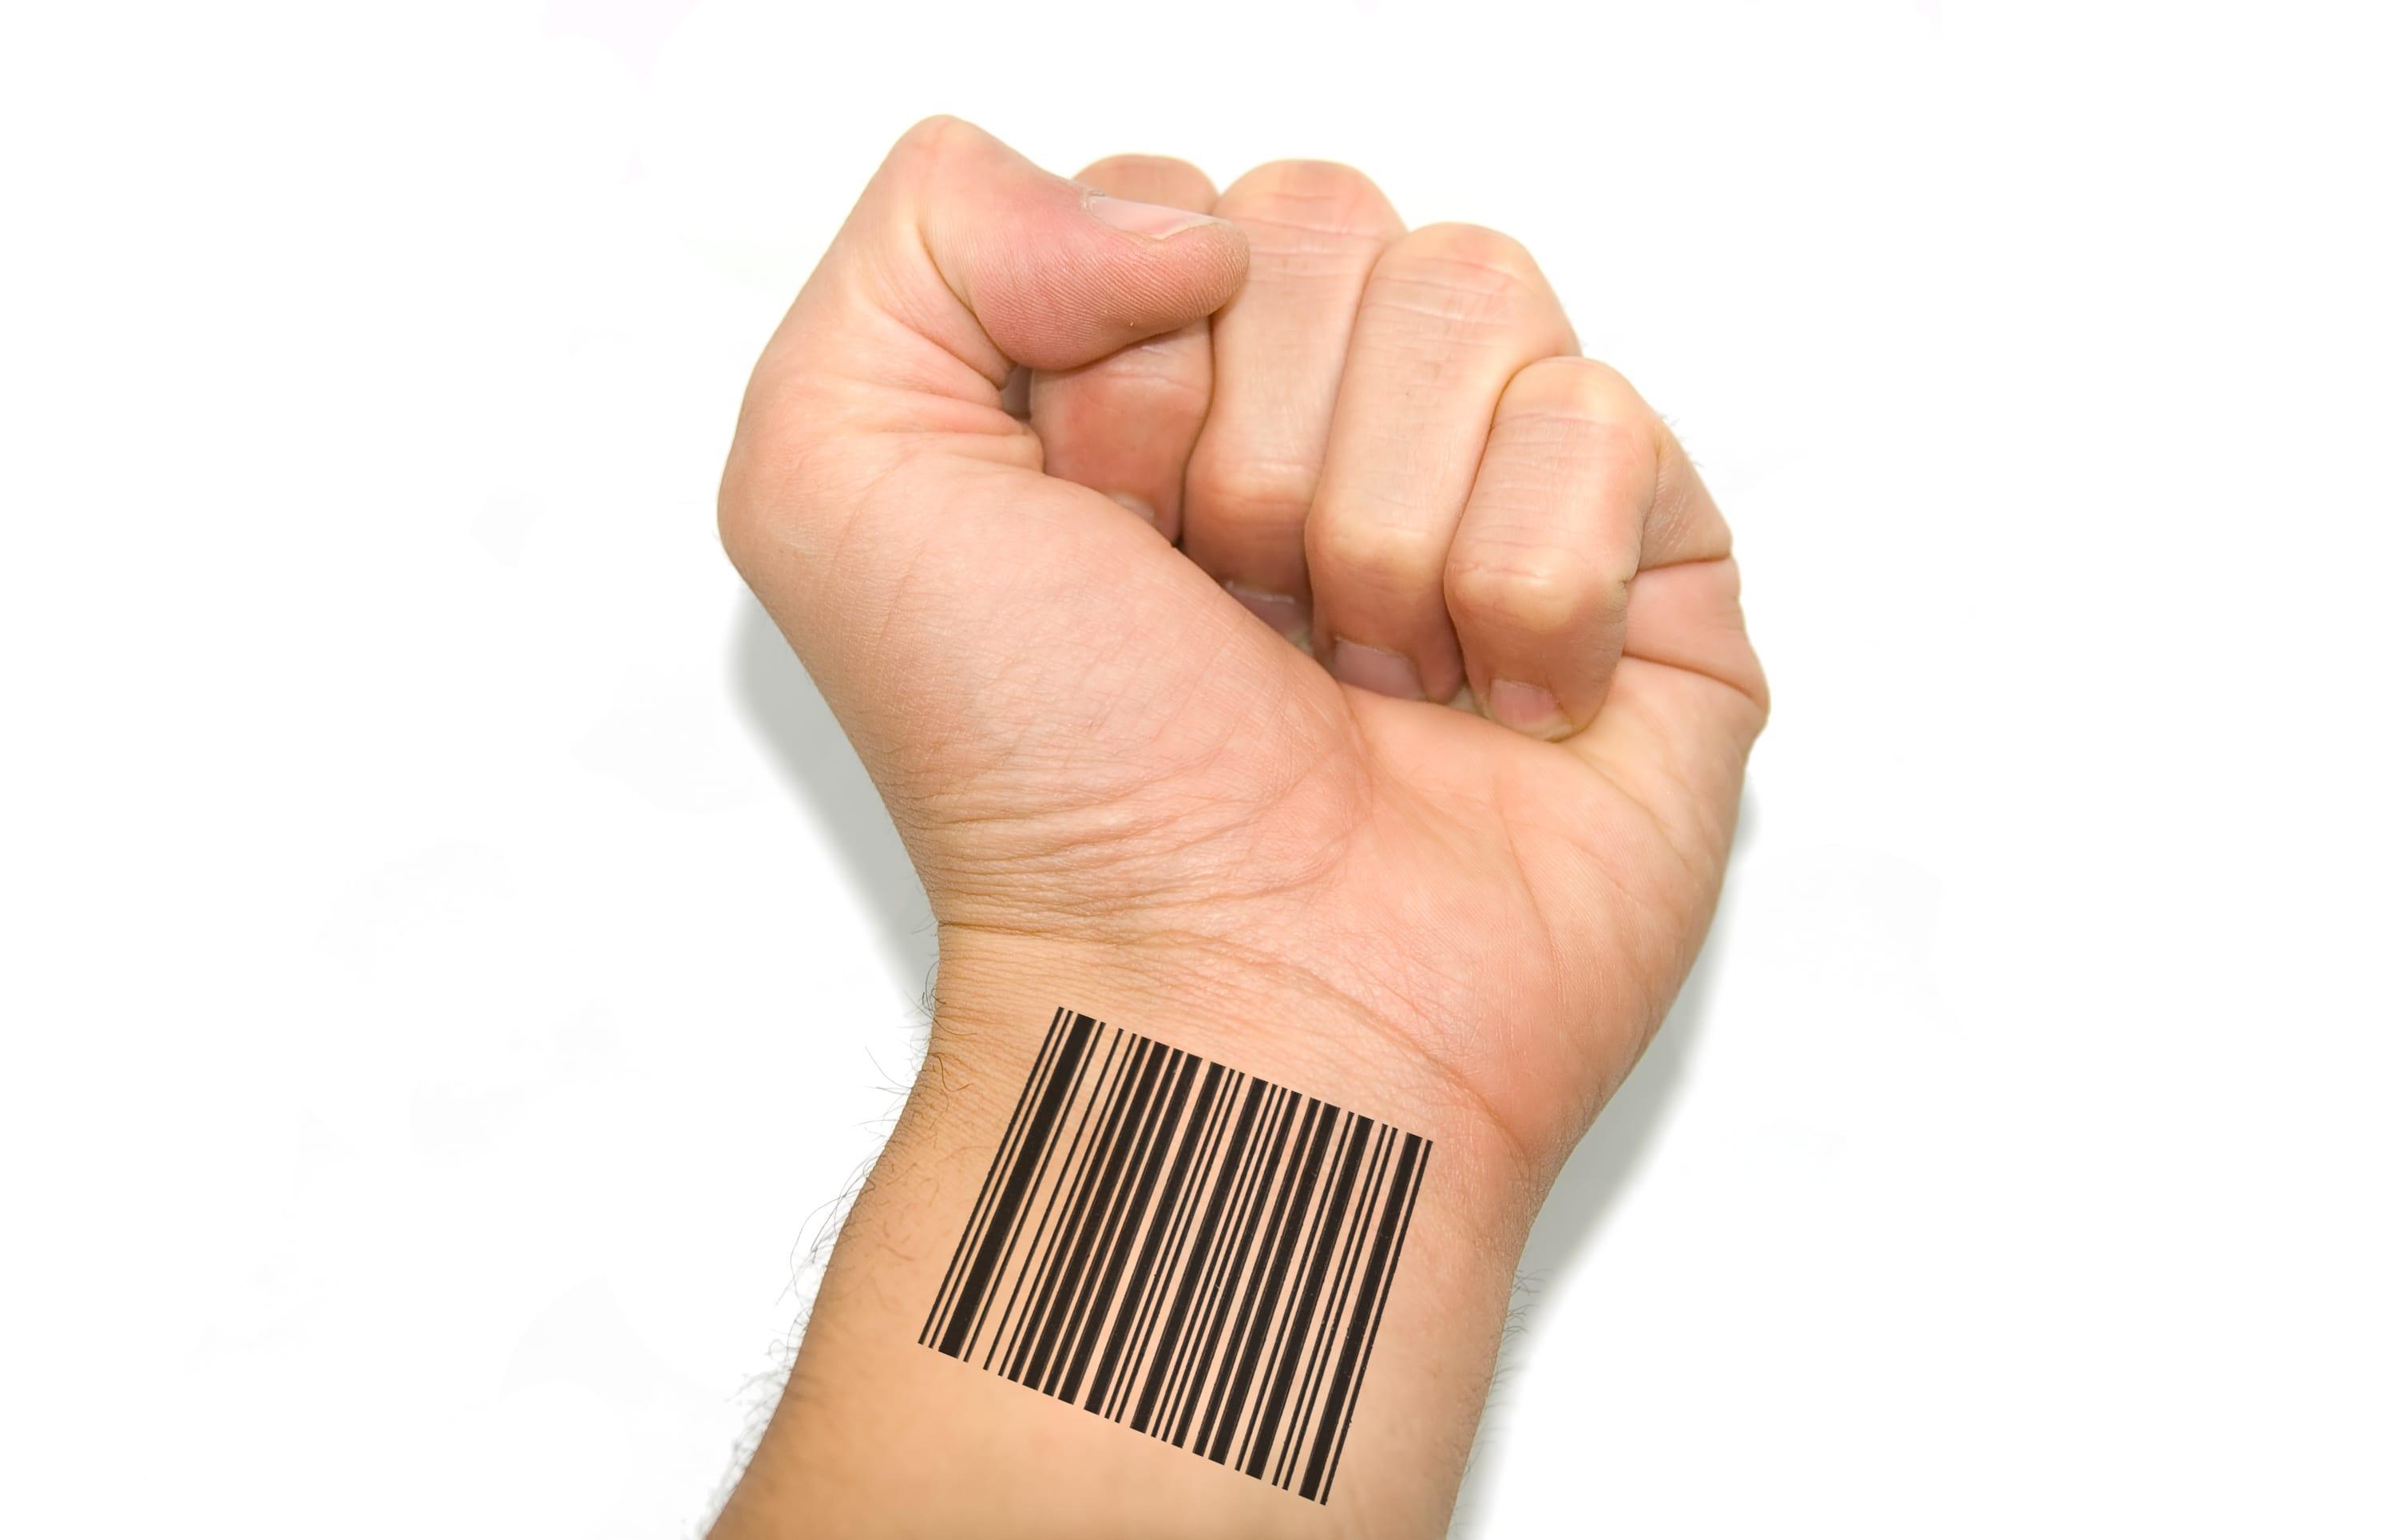 Payer avec son tatouage - Oney.jpg